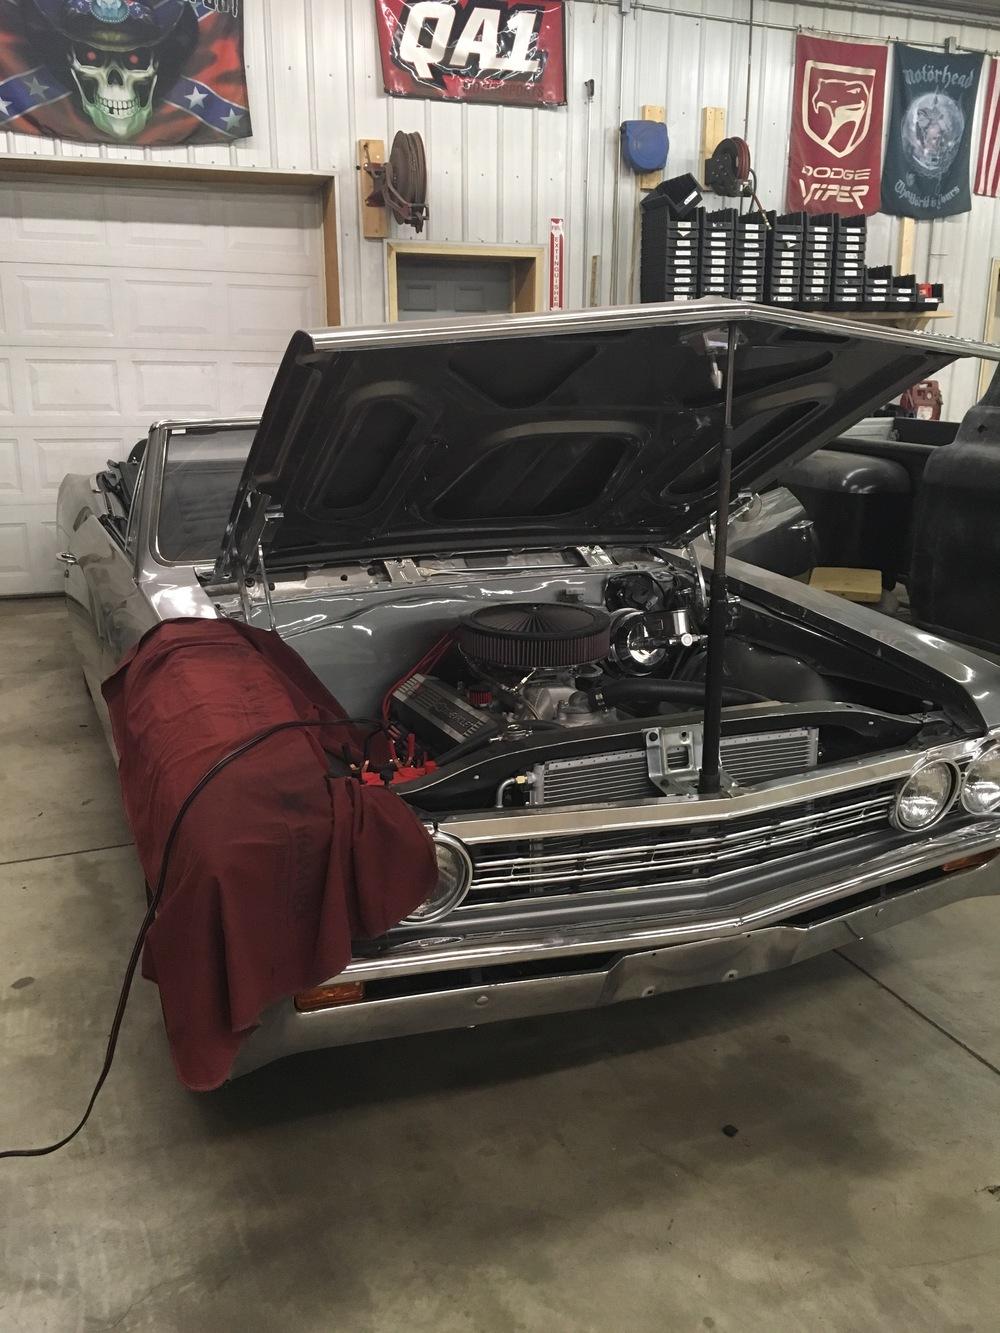 1967-chevelle-ss-minneapolis-hot-rod-custom-car-restoration-3.jpg